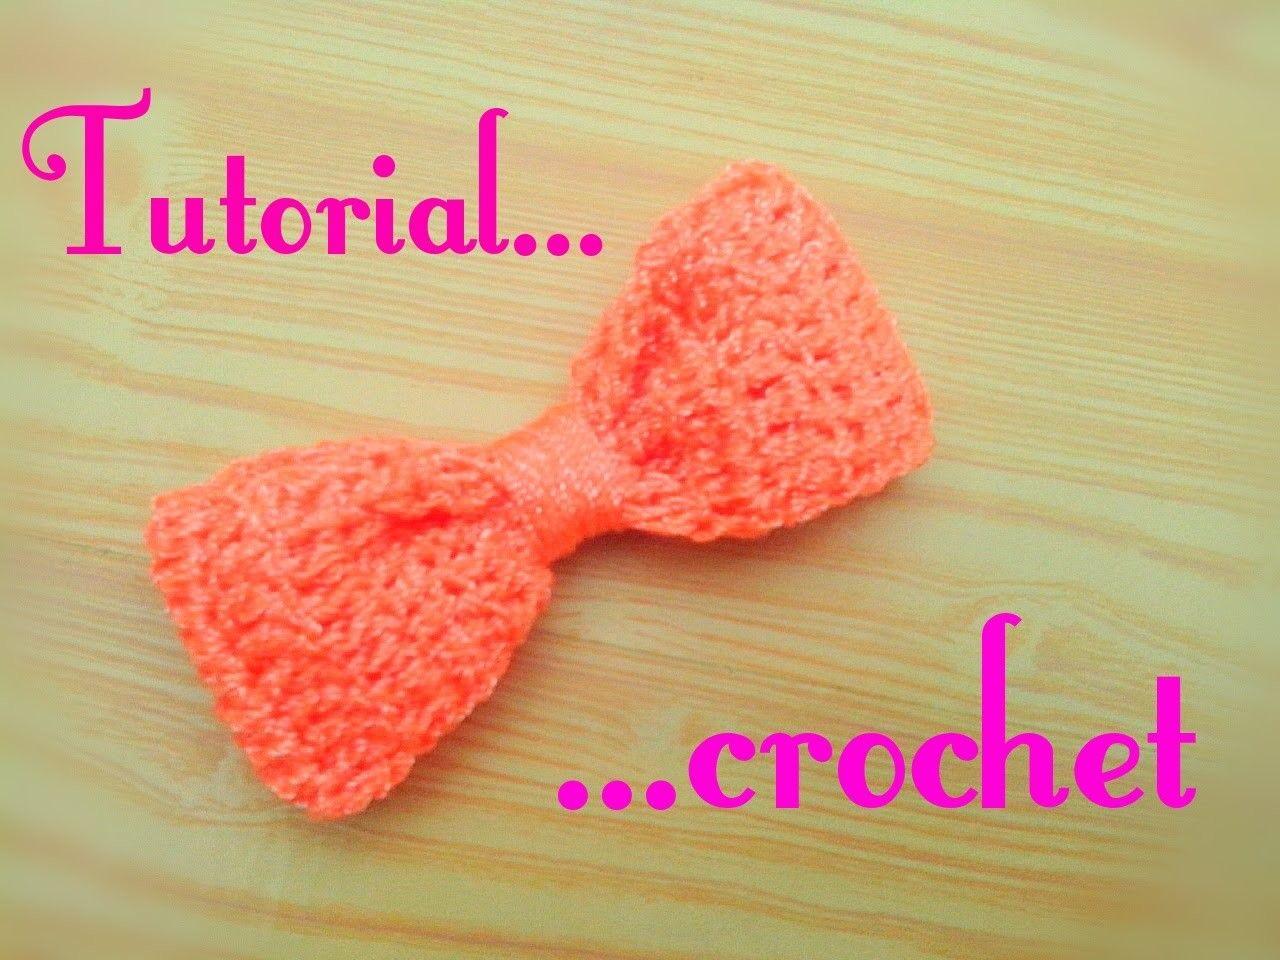 Moño tejido a crochet. lazo a crochet | Pinterest | Moños tejidos ...